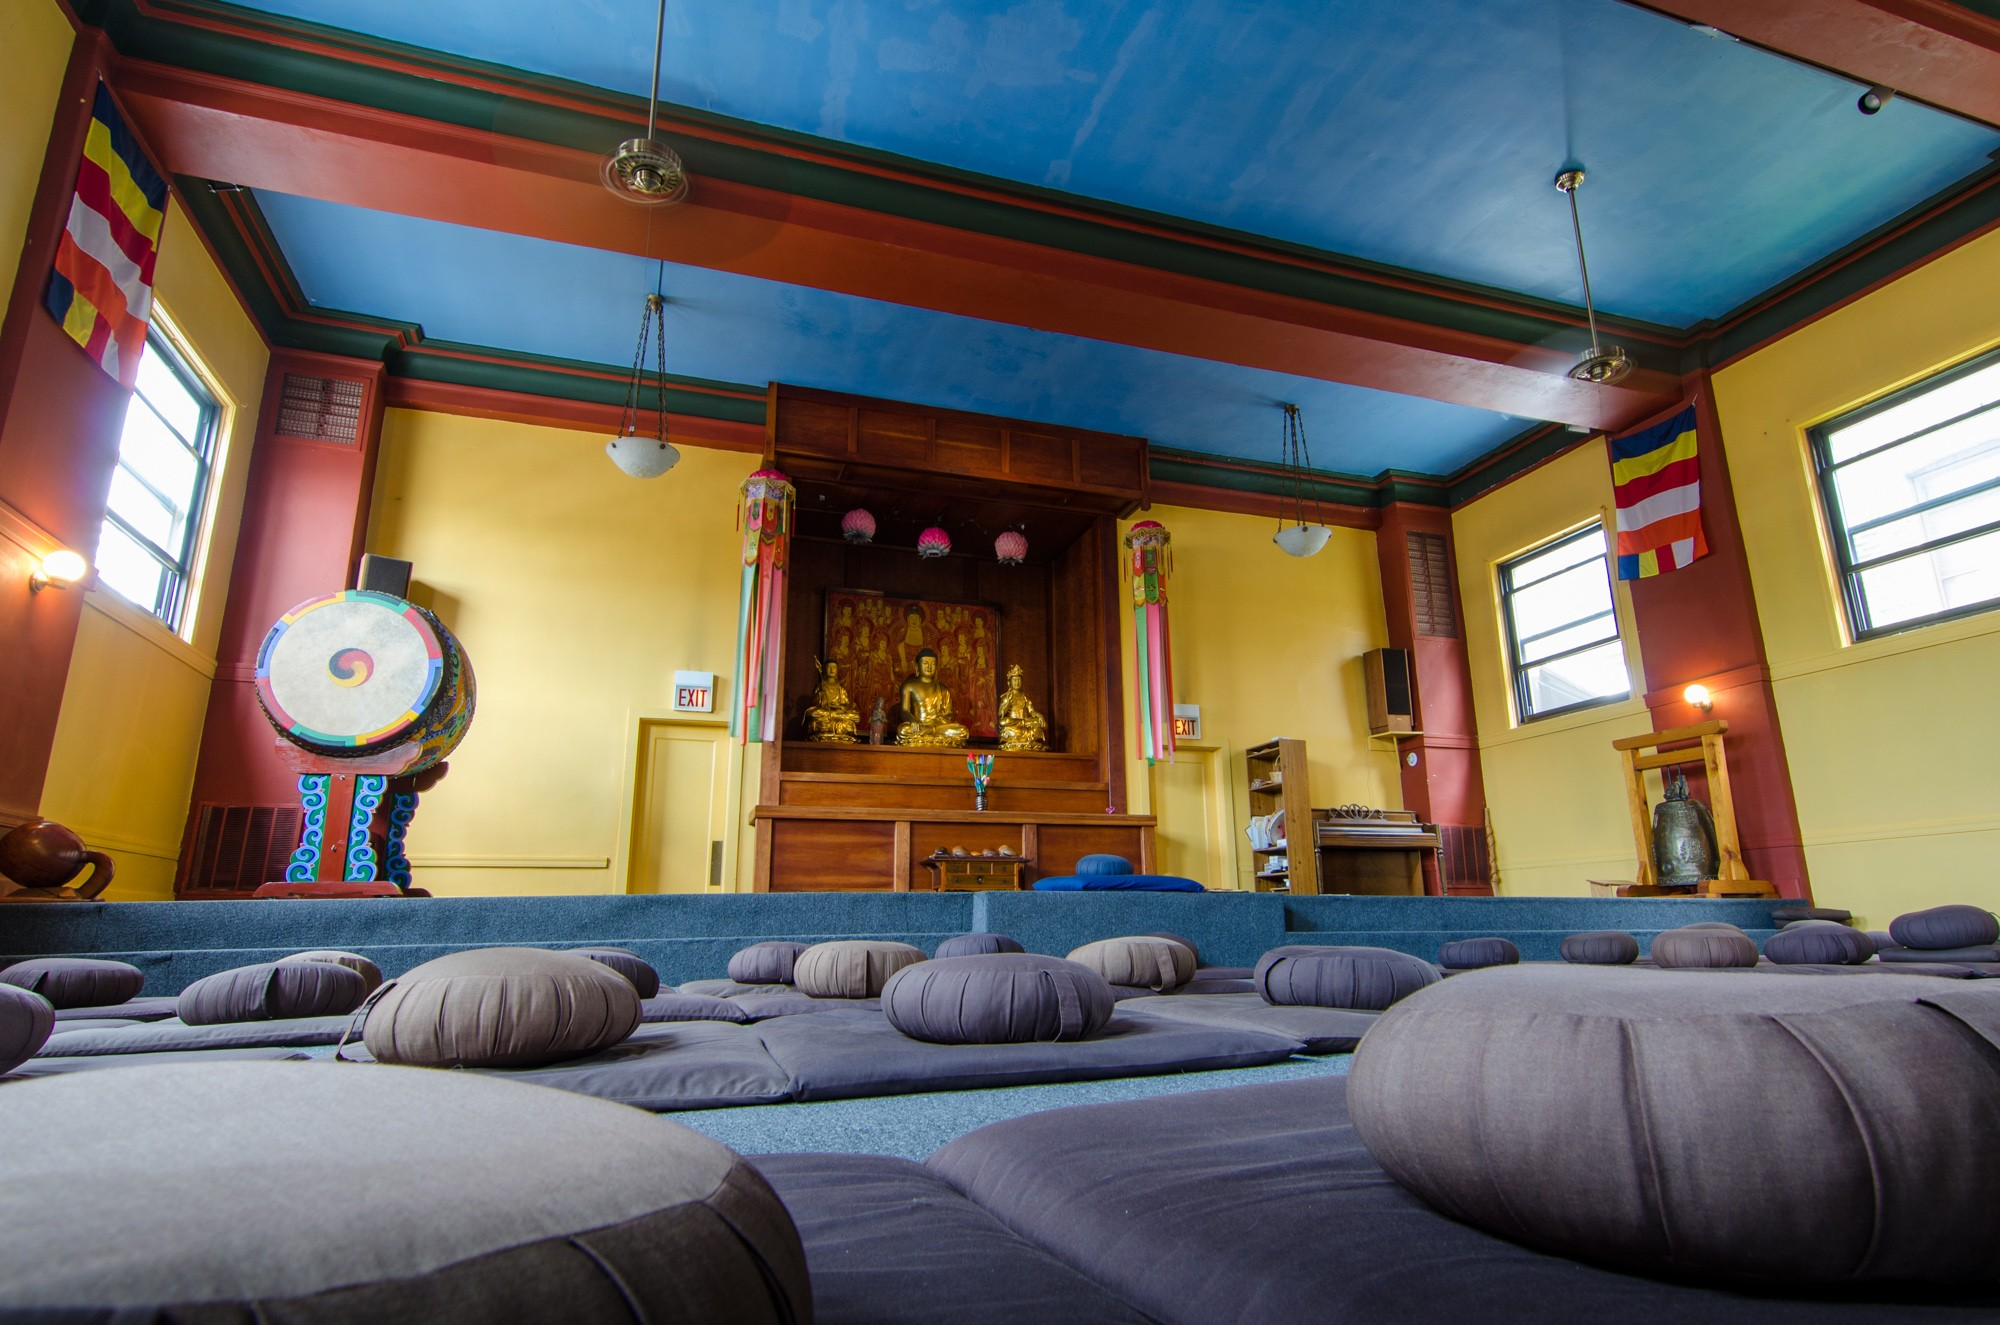 Zen Buddhist Temple Neighborhoods Open House Chicago